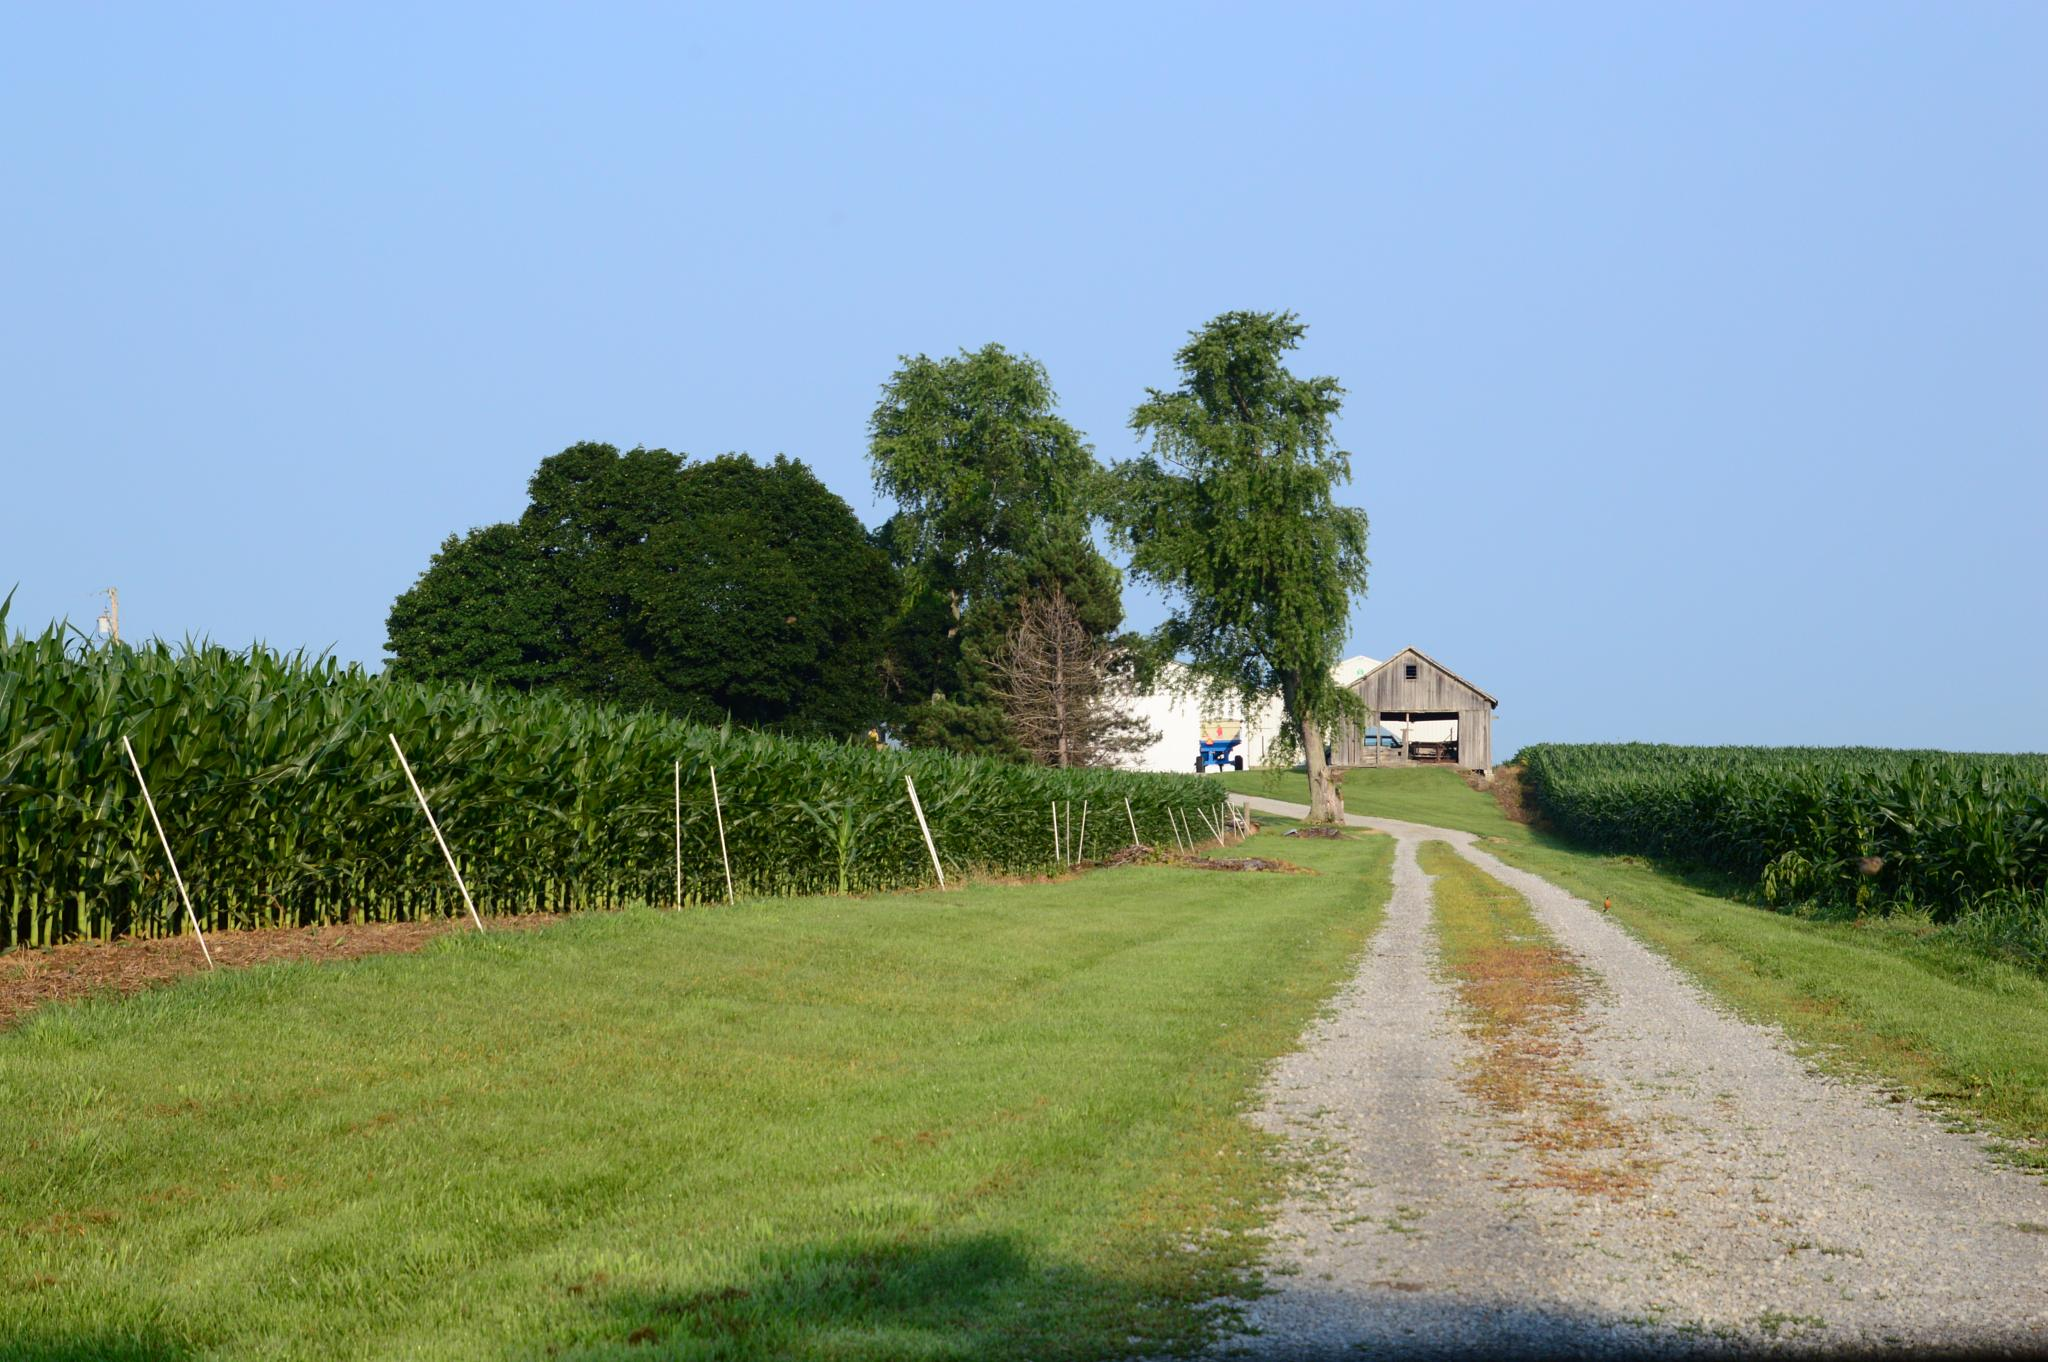 Ohio Farm by Doug Fosnight